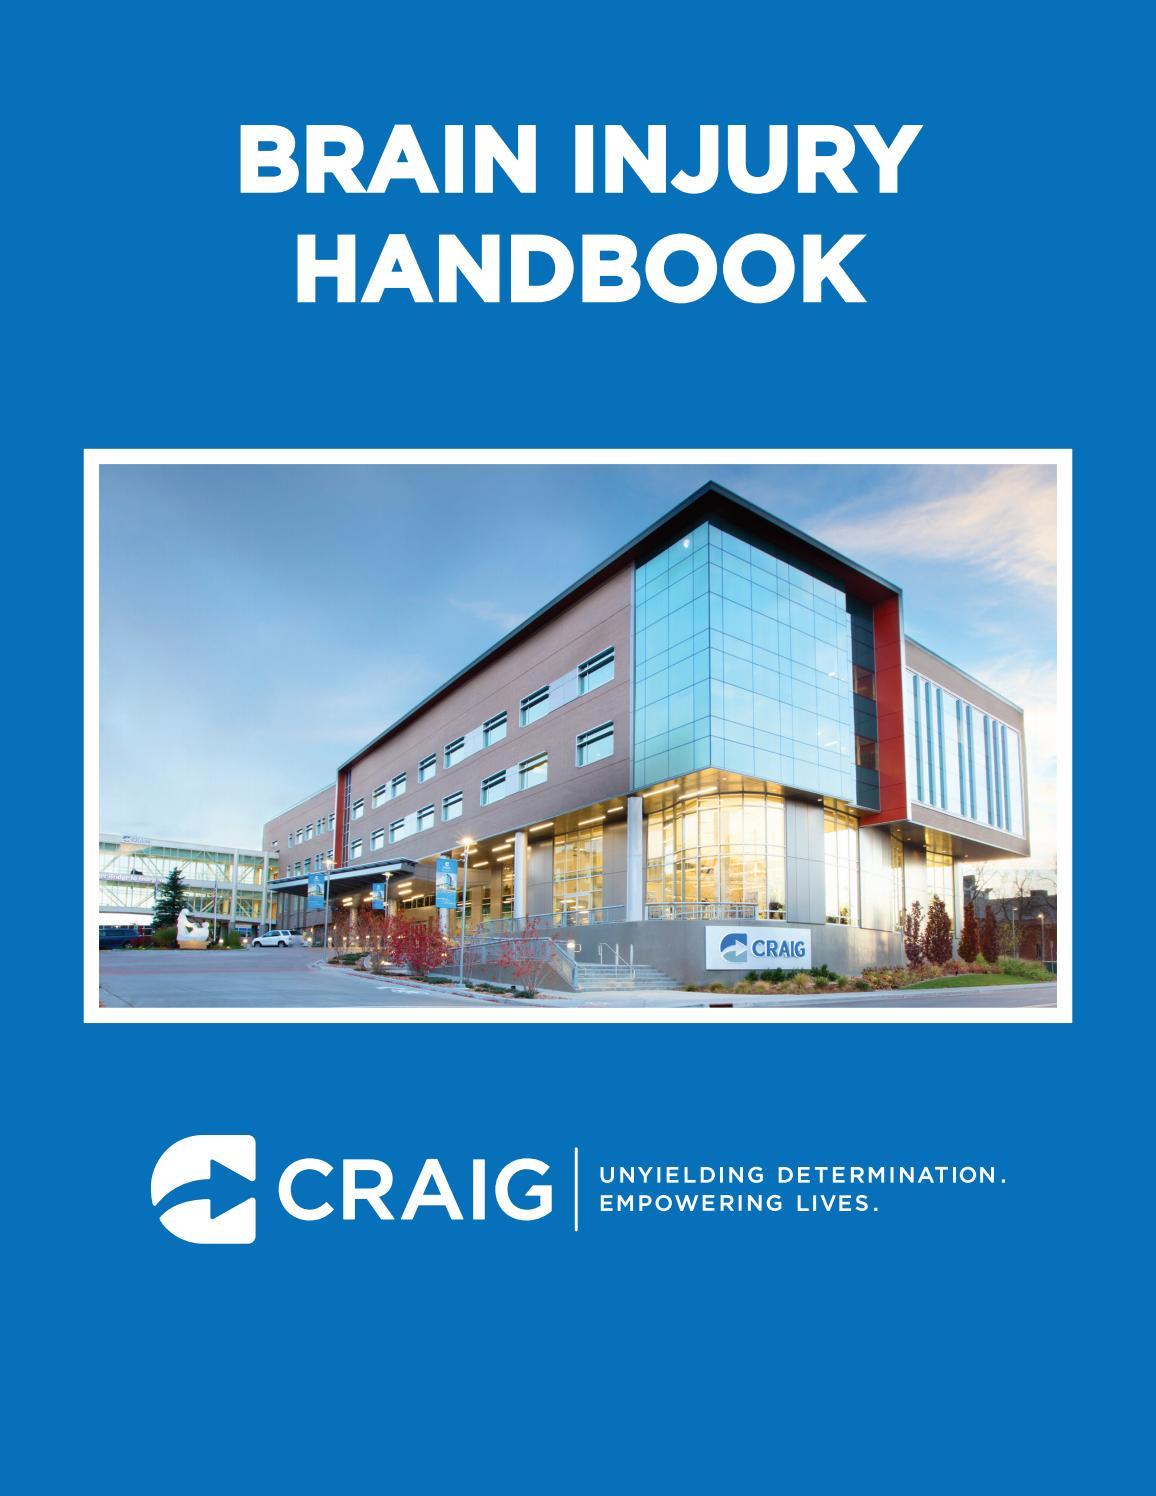 Craig Hospital Brain Injury Handbook by Craig Hospital - issuu